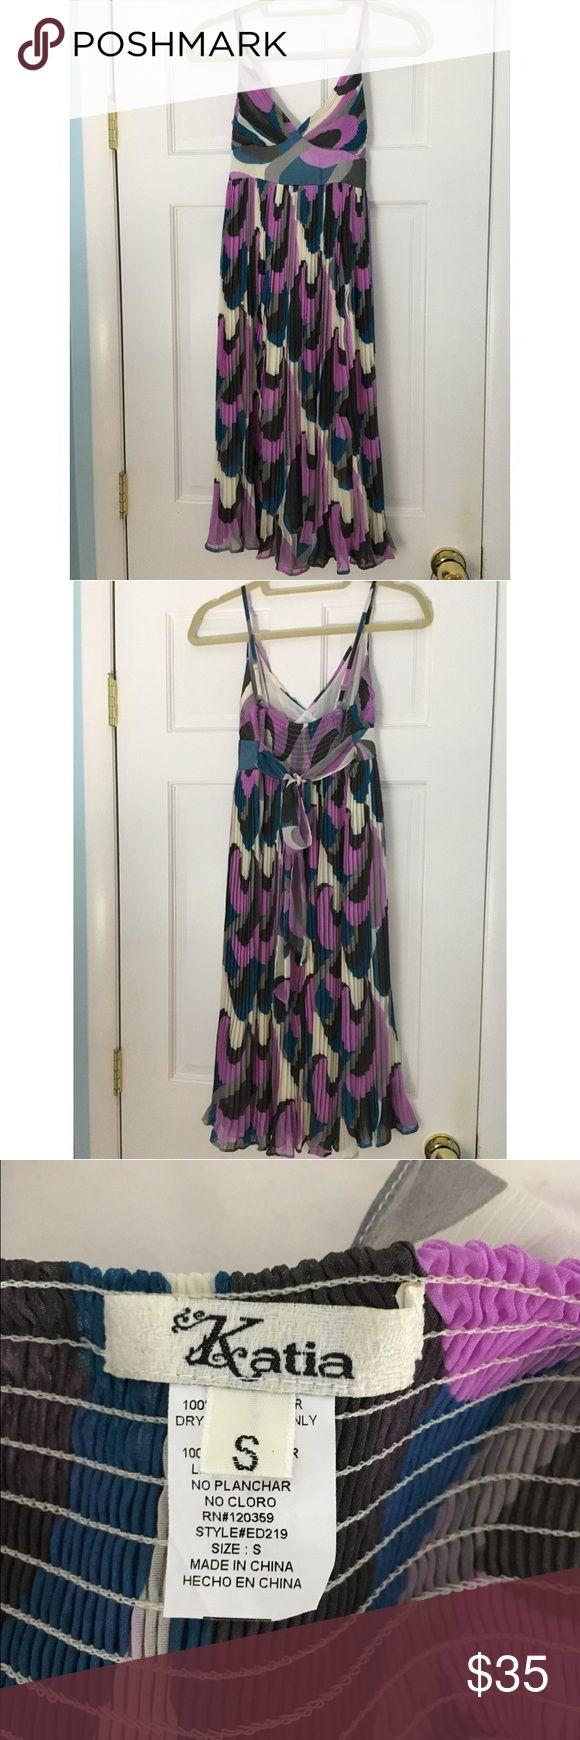 Katia spaghetti strap dress Katia multi-colored spaghetti strap dress. Fitted bodice. Flowy skirt. Ties in back. Worn once for a wedding. Dresses